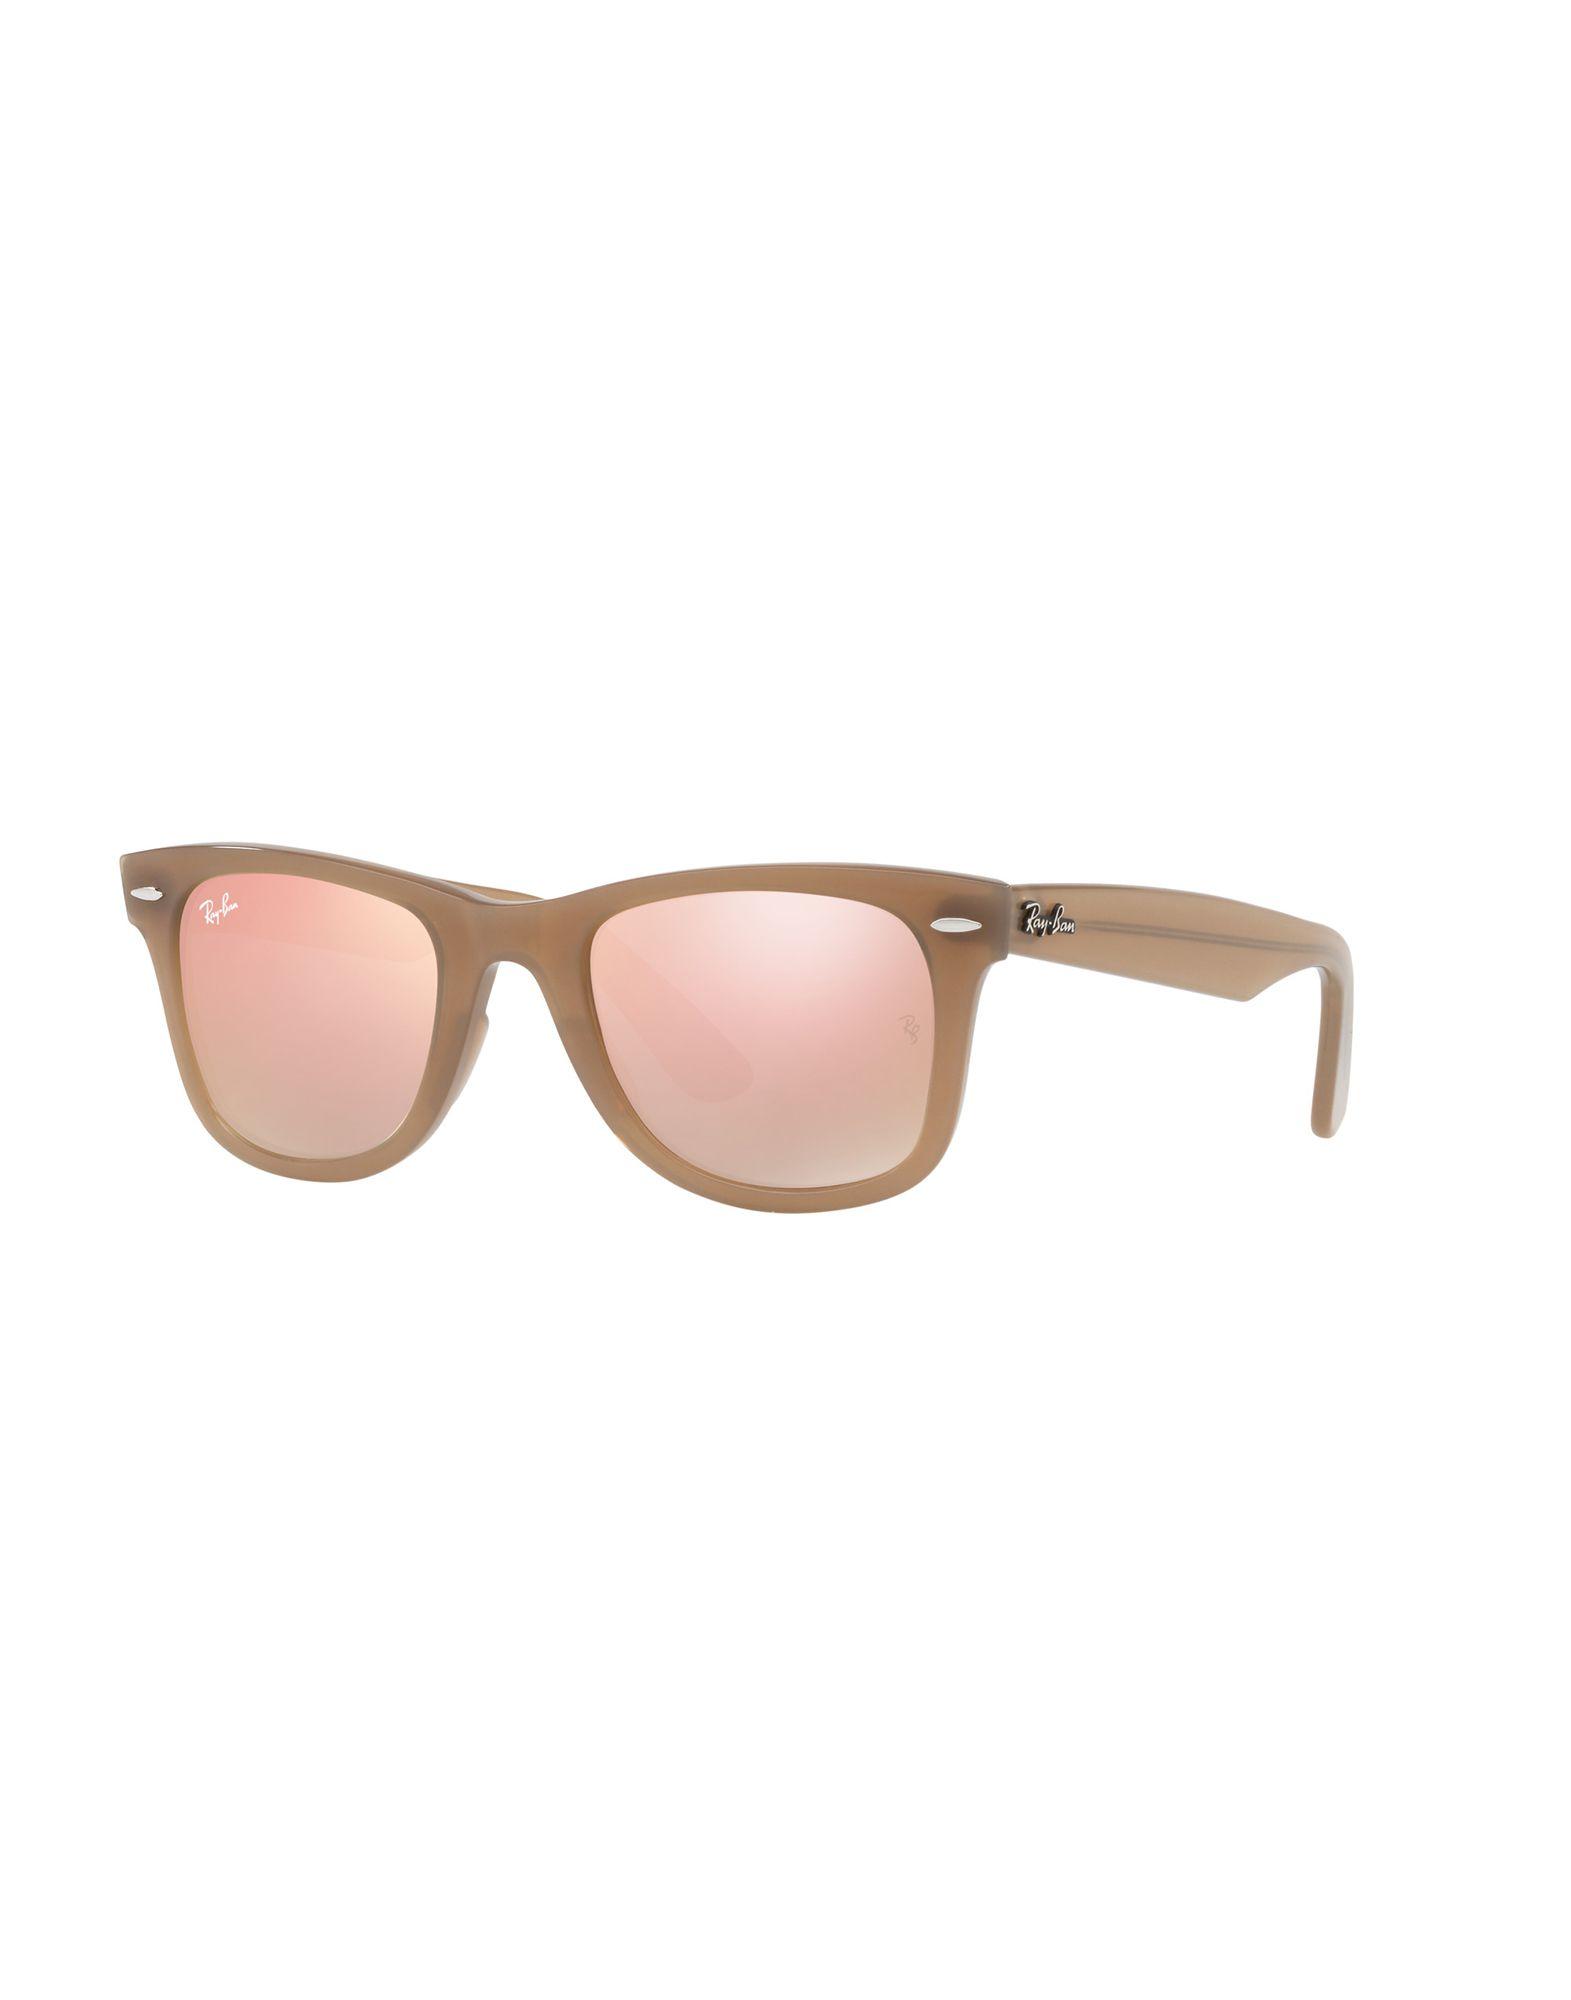 Occhiali Da Sole Ray-Ban Rb4340 Wayfarer - Uomo - Acquista online su